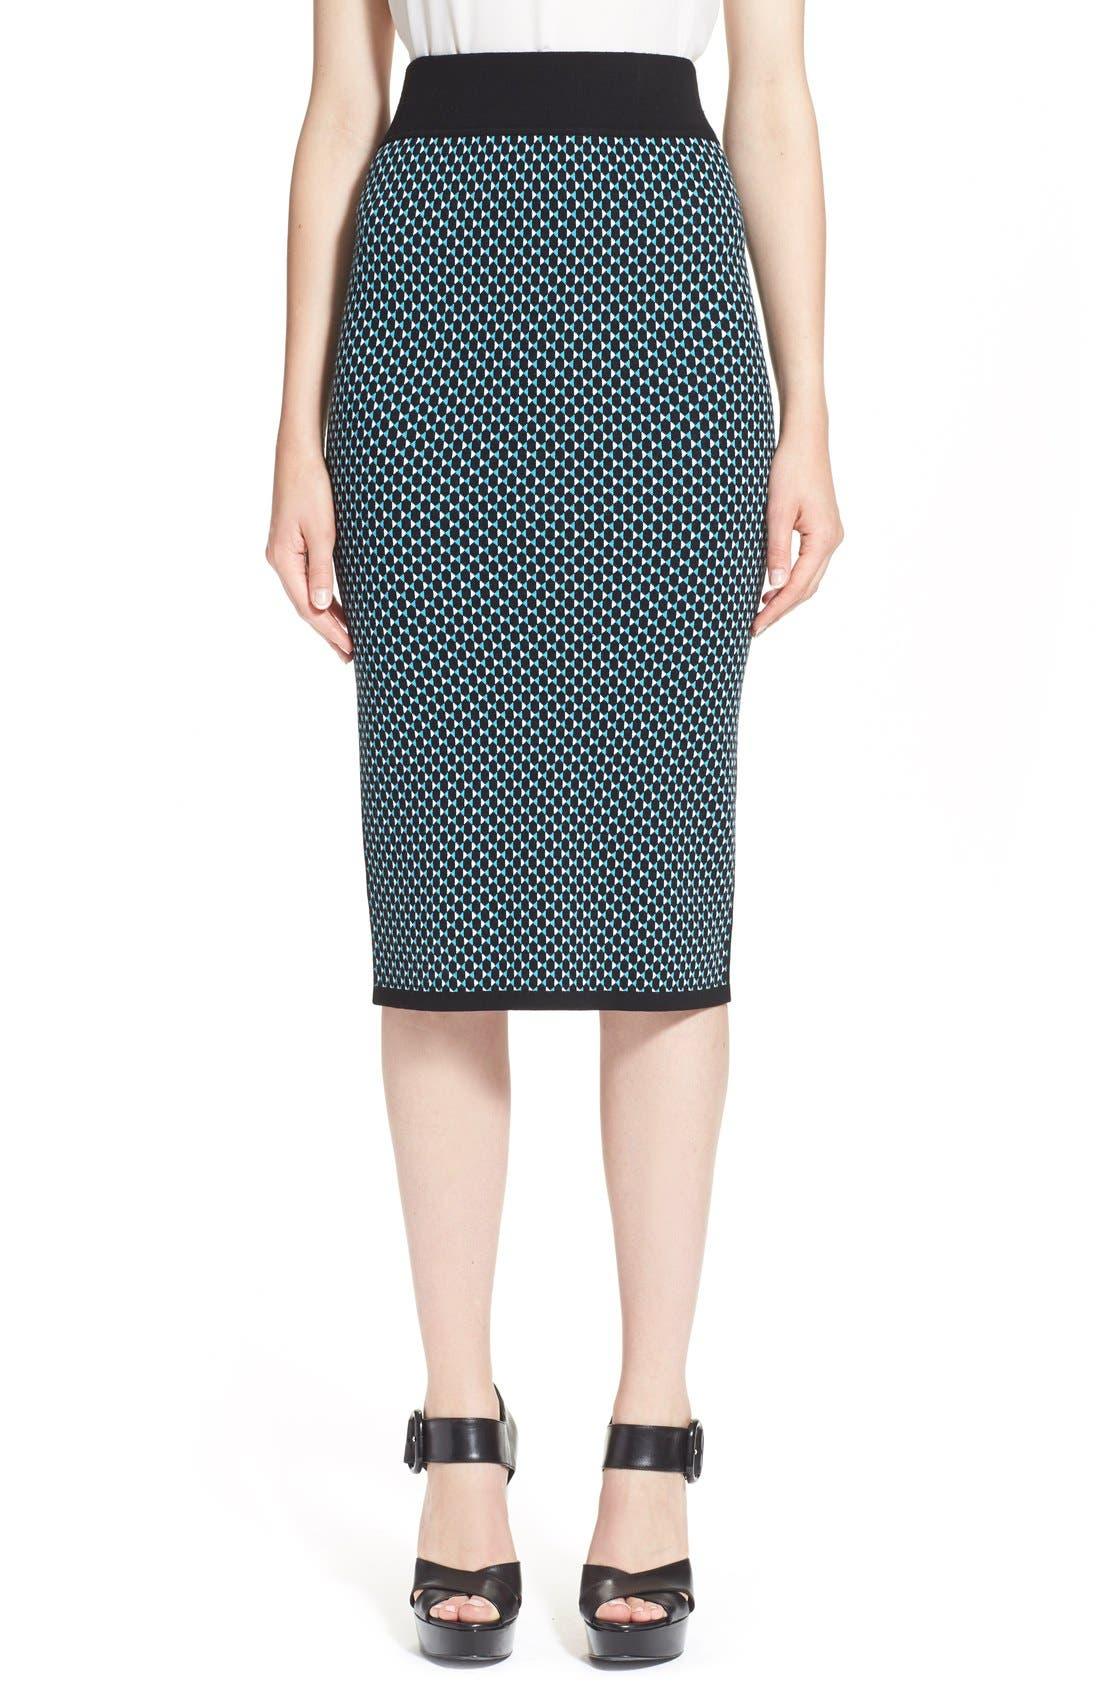 Alternate Image 1 Selected - Michael KorsDiamond Jacquard Pencil Skirt